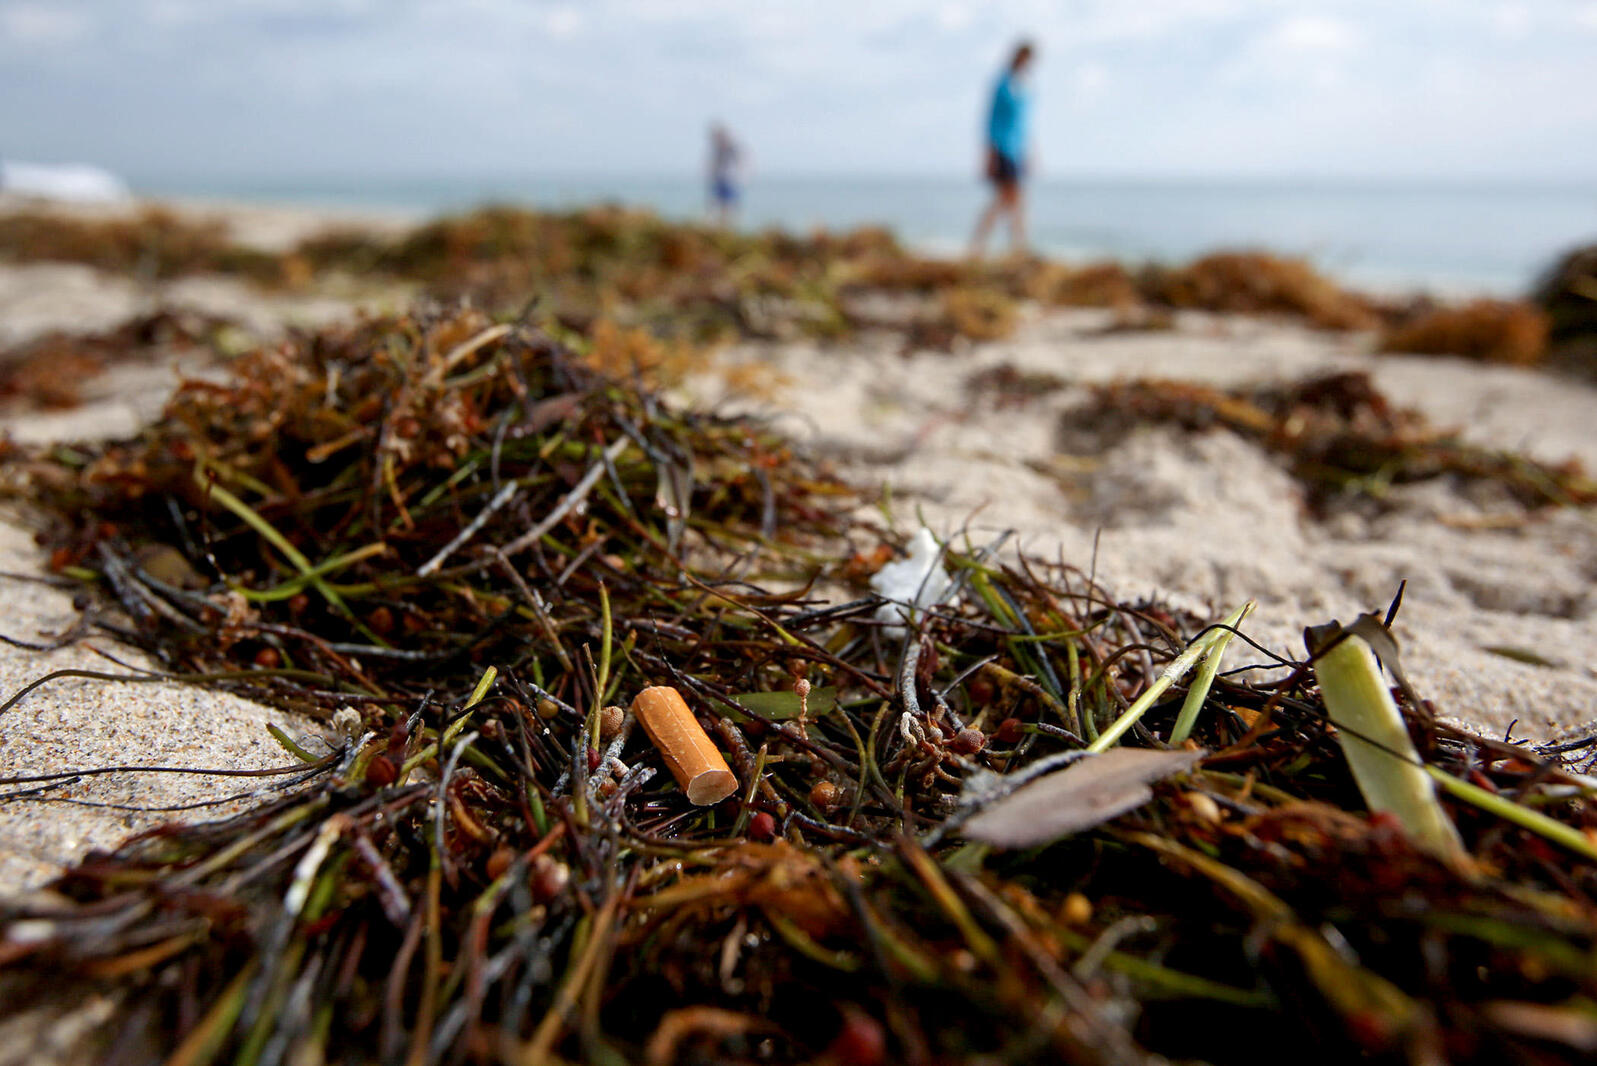 Cigarette butts litter a beach in Florida. Zuma Press Inc/Alamy